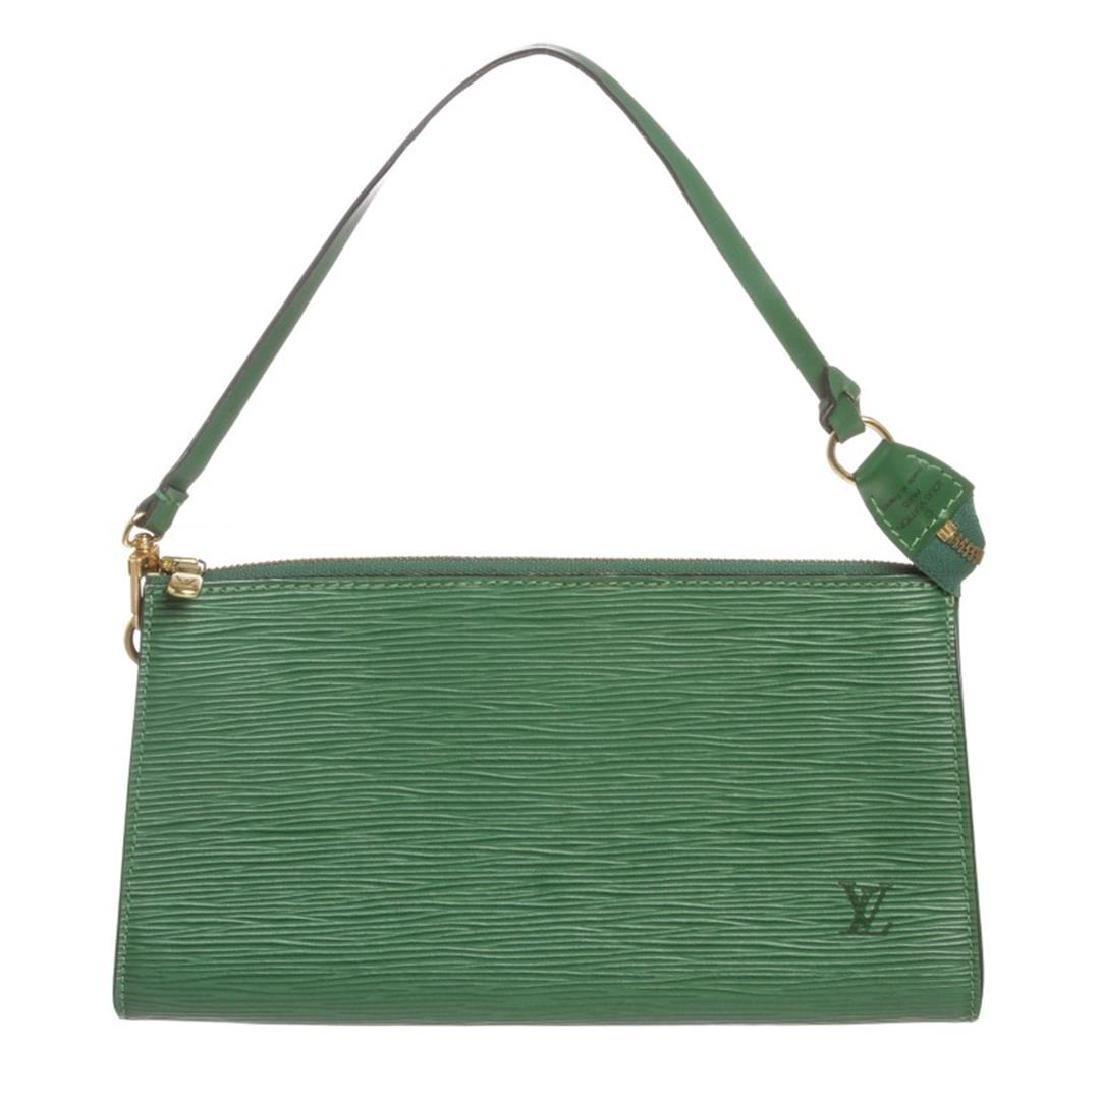 Louis Vuitton Green Epi Leather Pochette Shoulder Bag